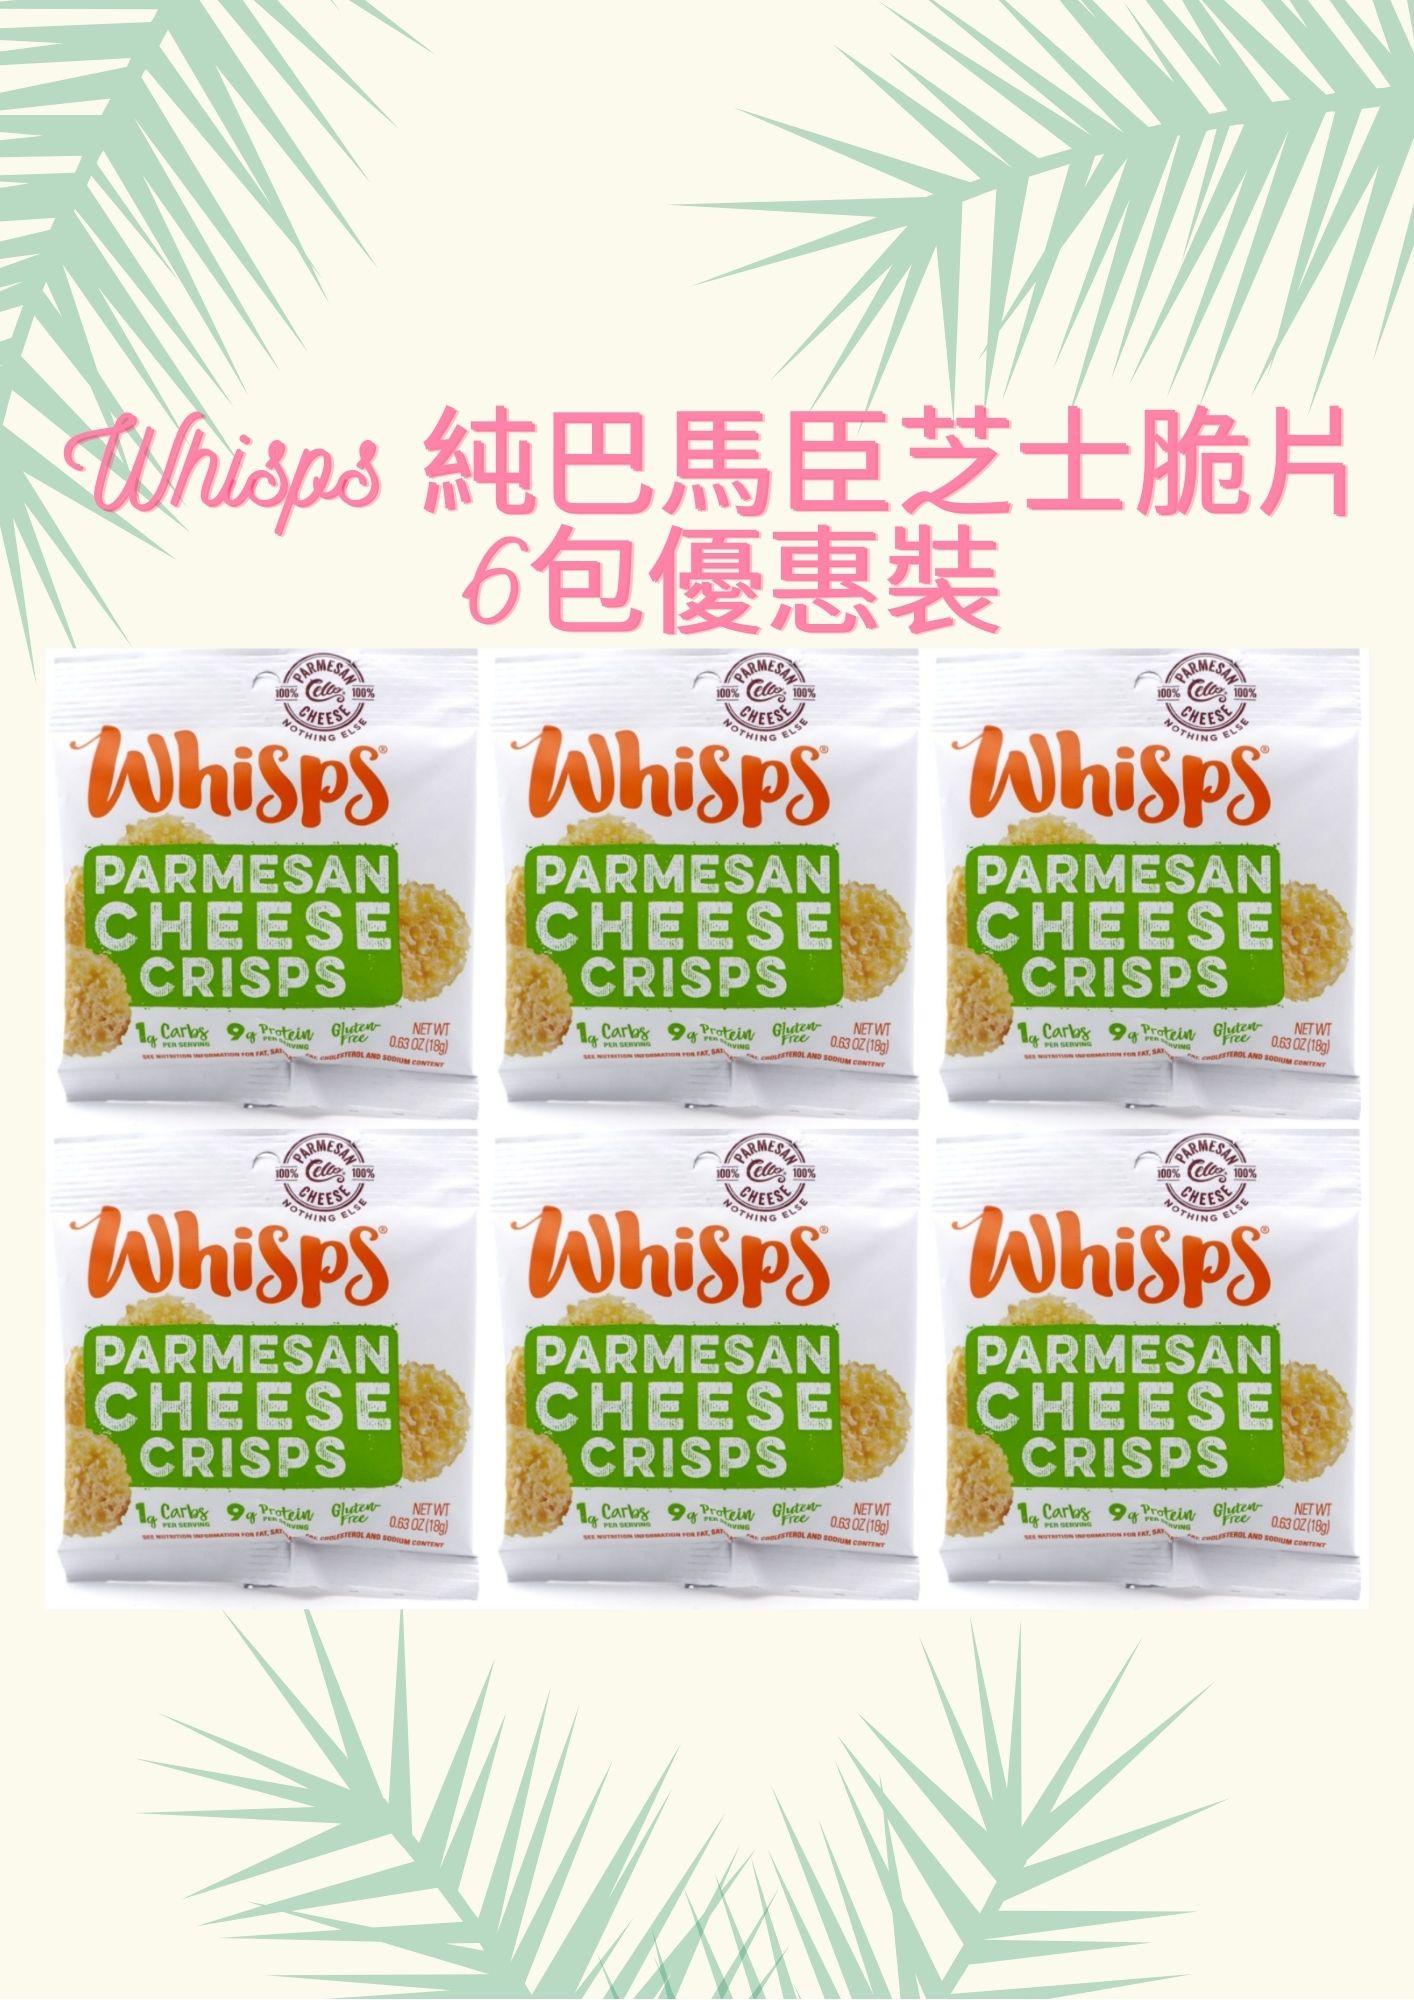 Whisps 純巴馬臣芝士脆片 6包優惠裝